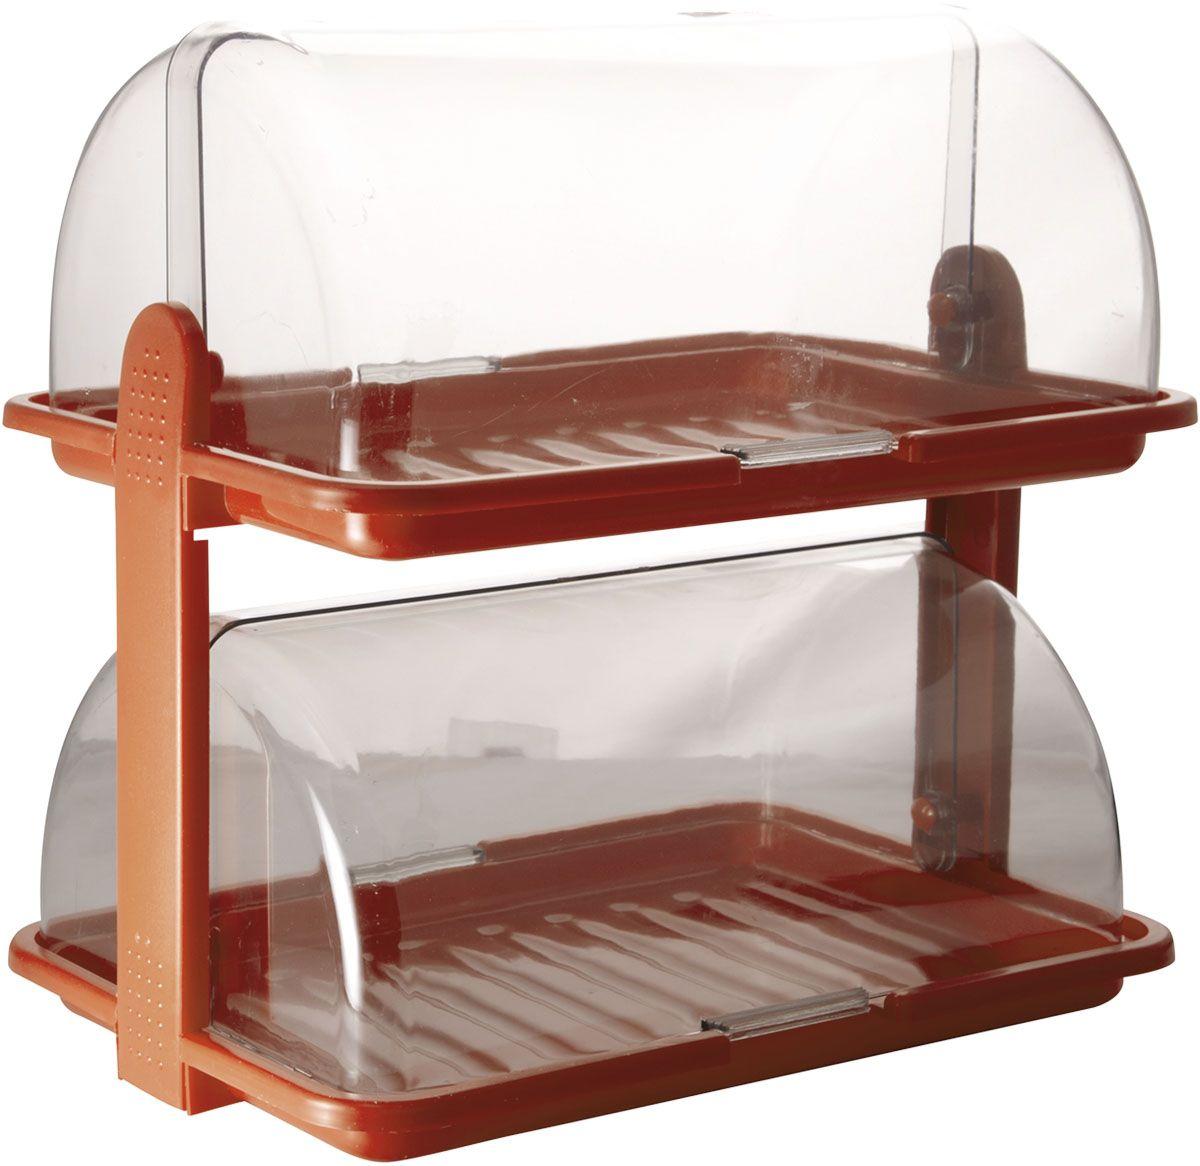 "Хлебница ""Plastic Centre"", 2-ярусная, цвет: коричневый, прозрачный, 38,5 х 26 х 37 см"